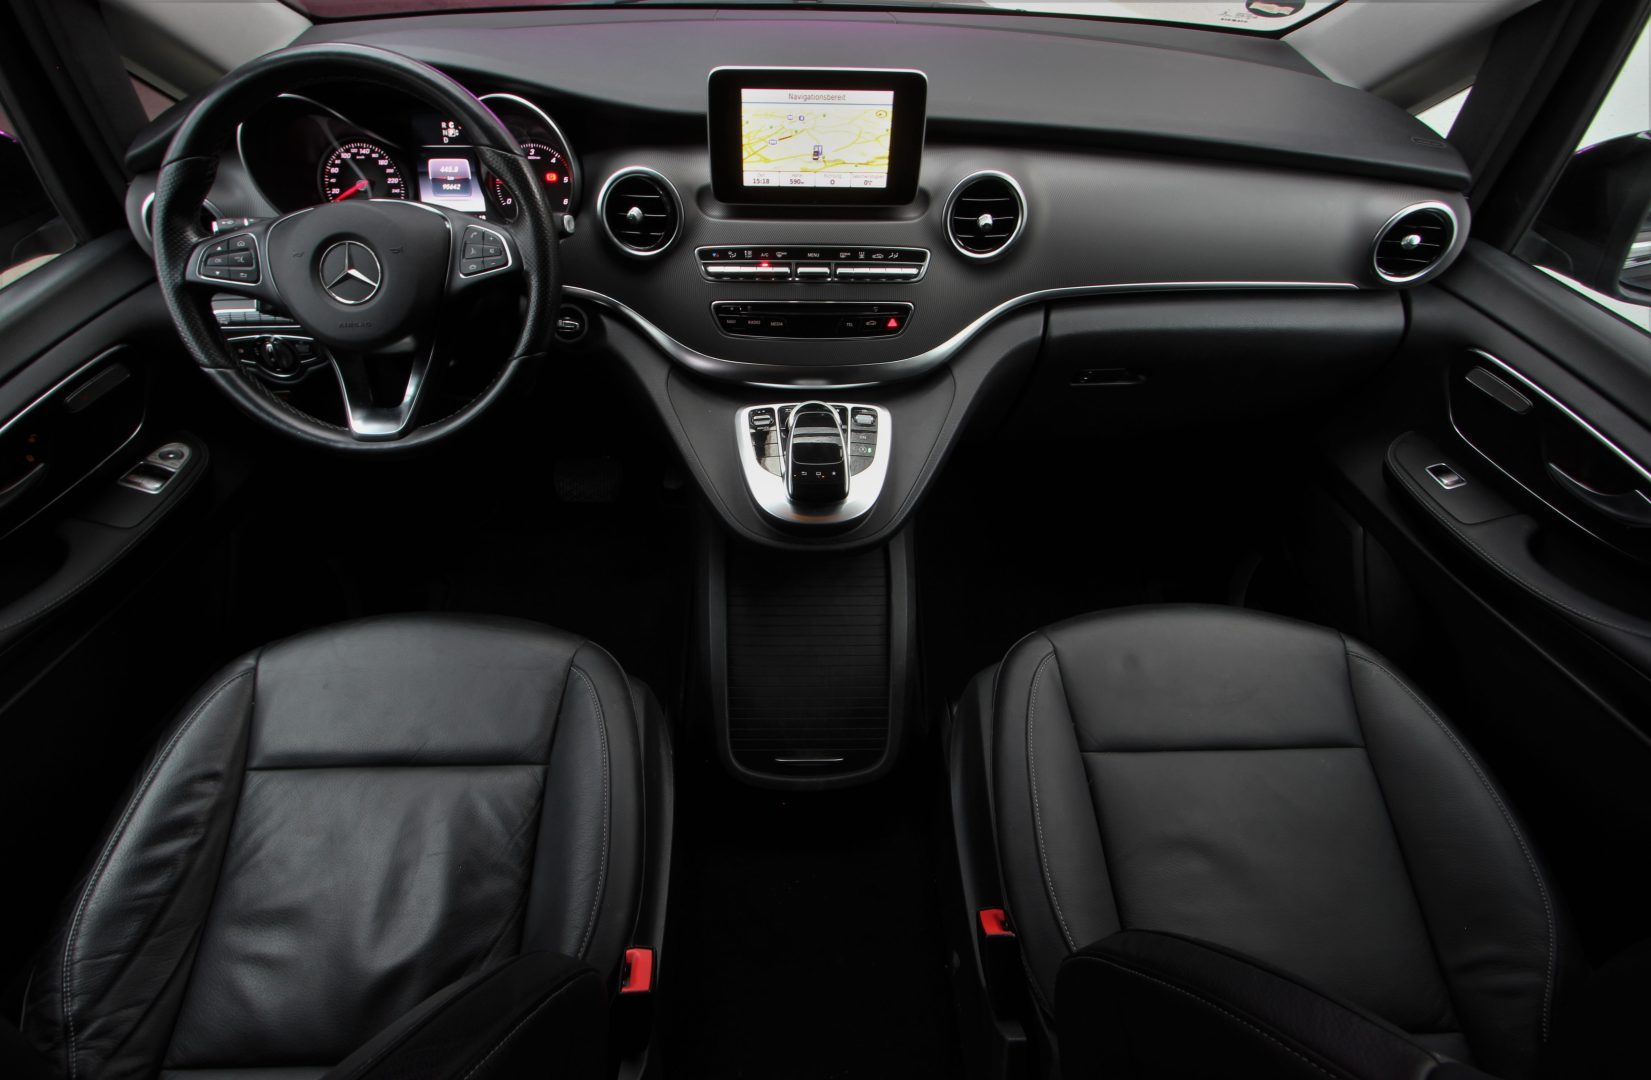 AIL Mercedes-Benz V 250 CDI/BT/d AVANTGARD LED  12